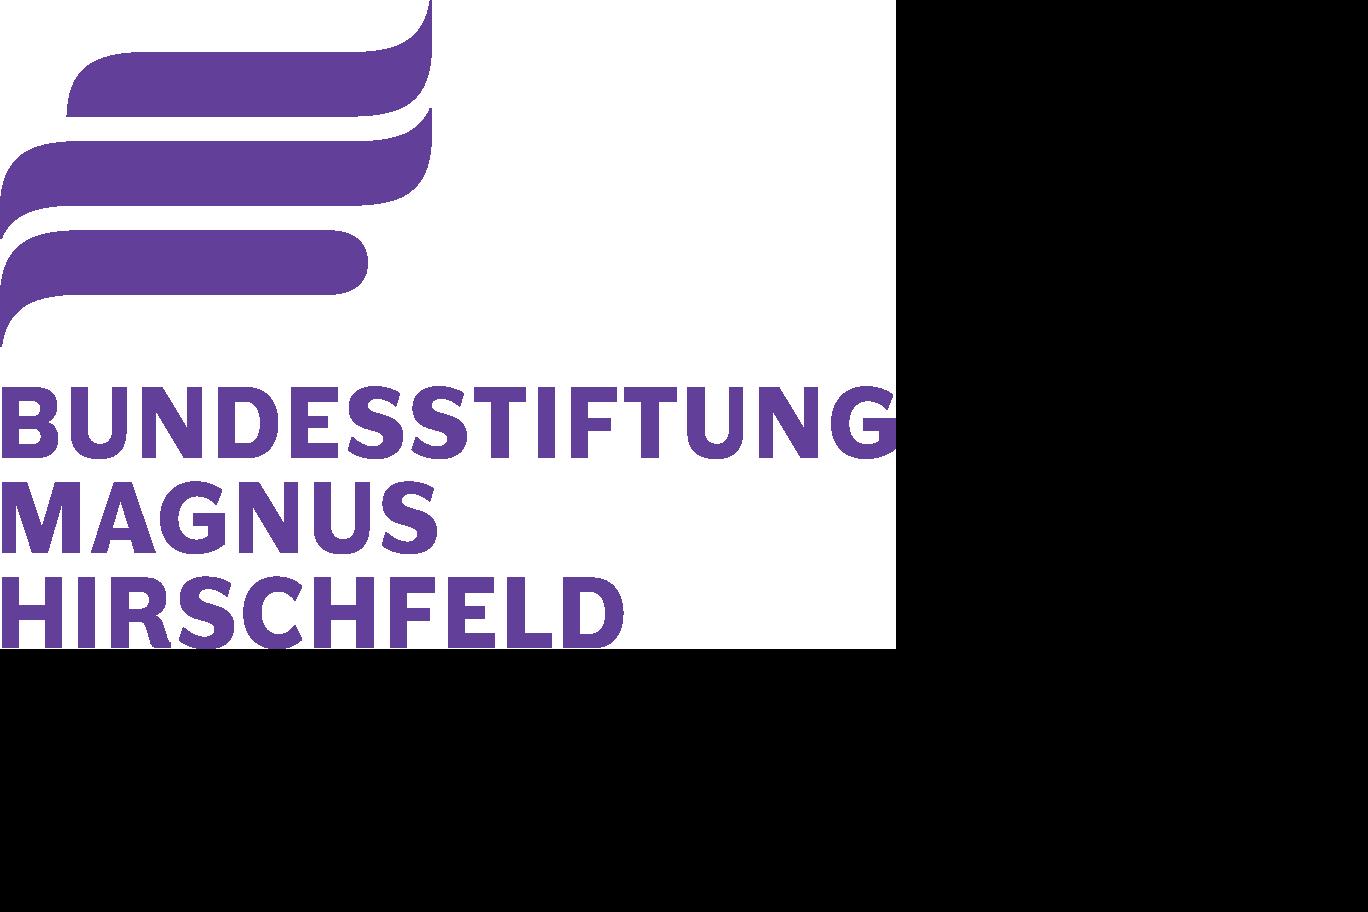 Federal Foundation Magnus Hirschfeld